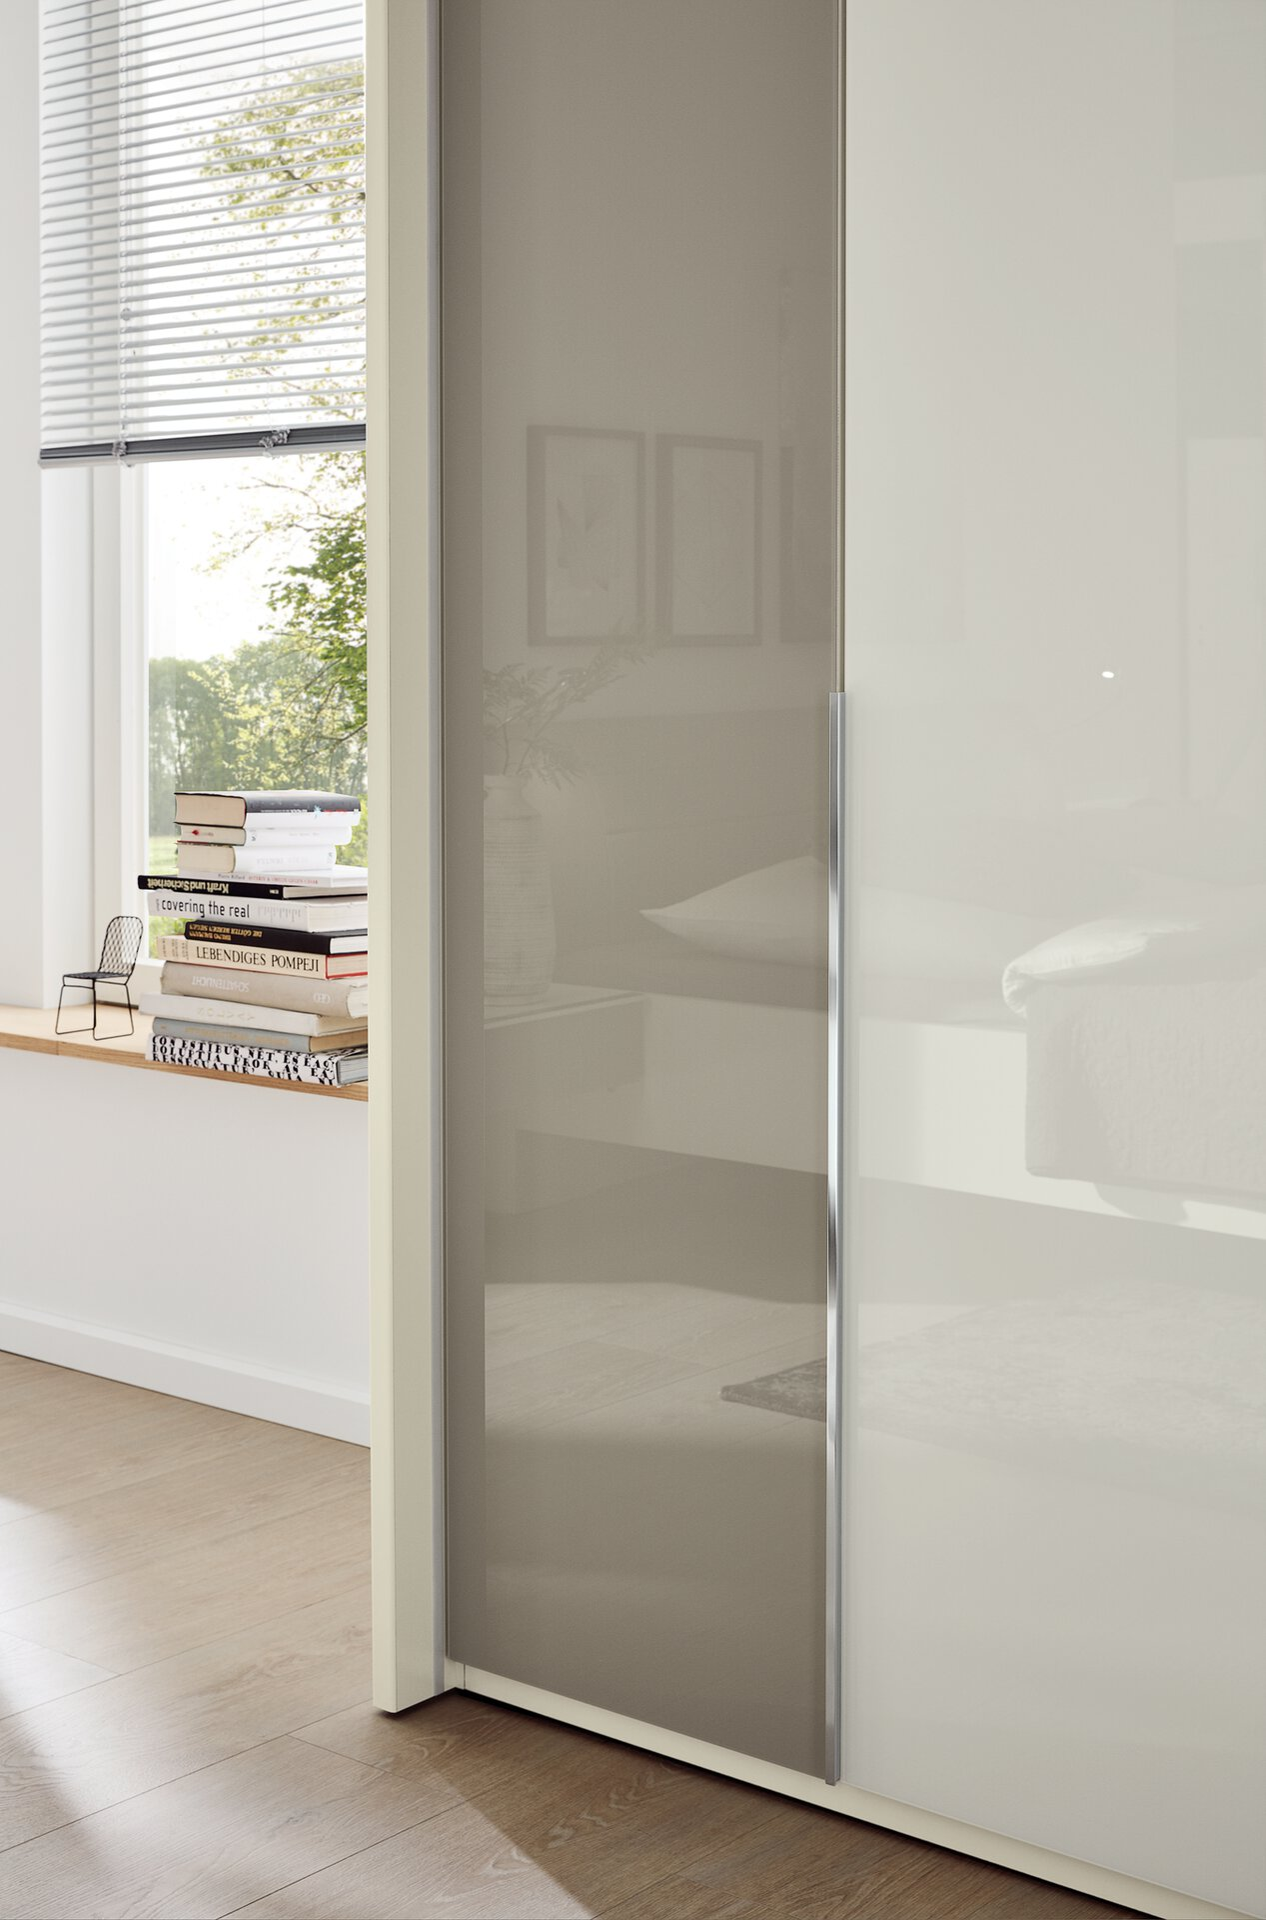 Schlafzimmer San Diego Musterring Holzwerkstoff grau 58 x 236 x 300 cm